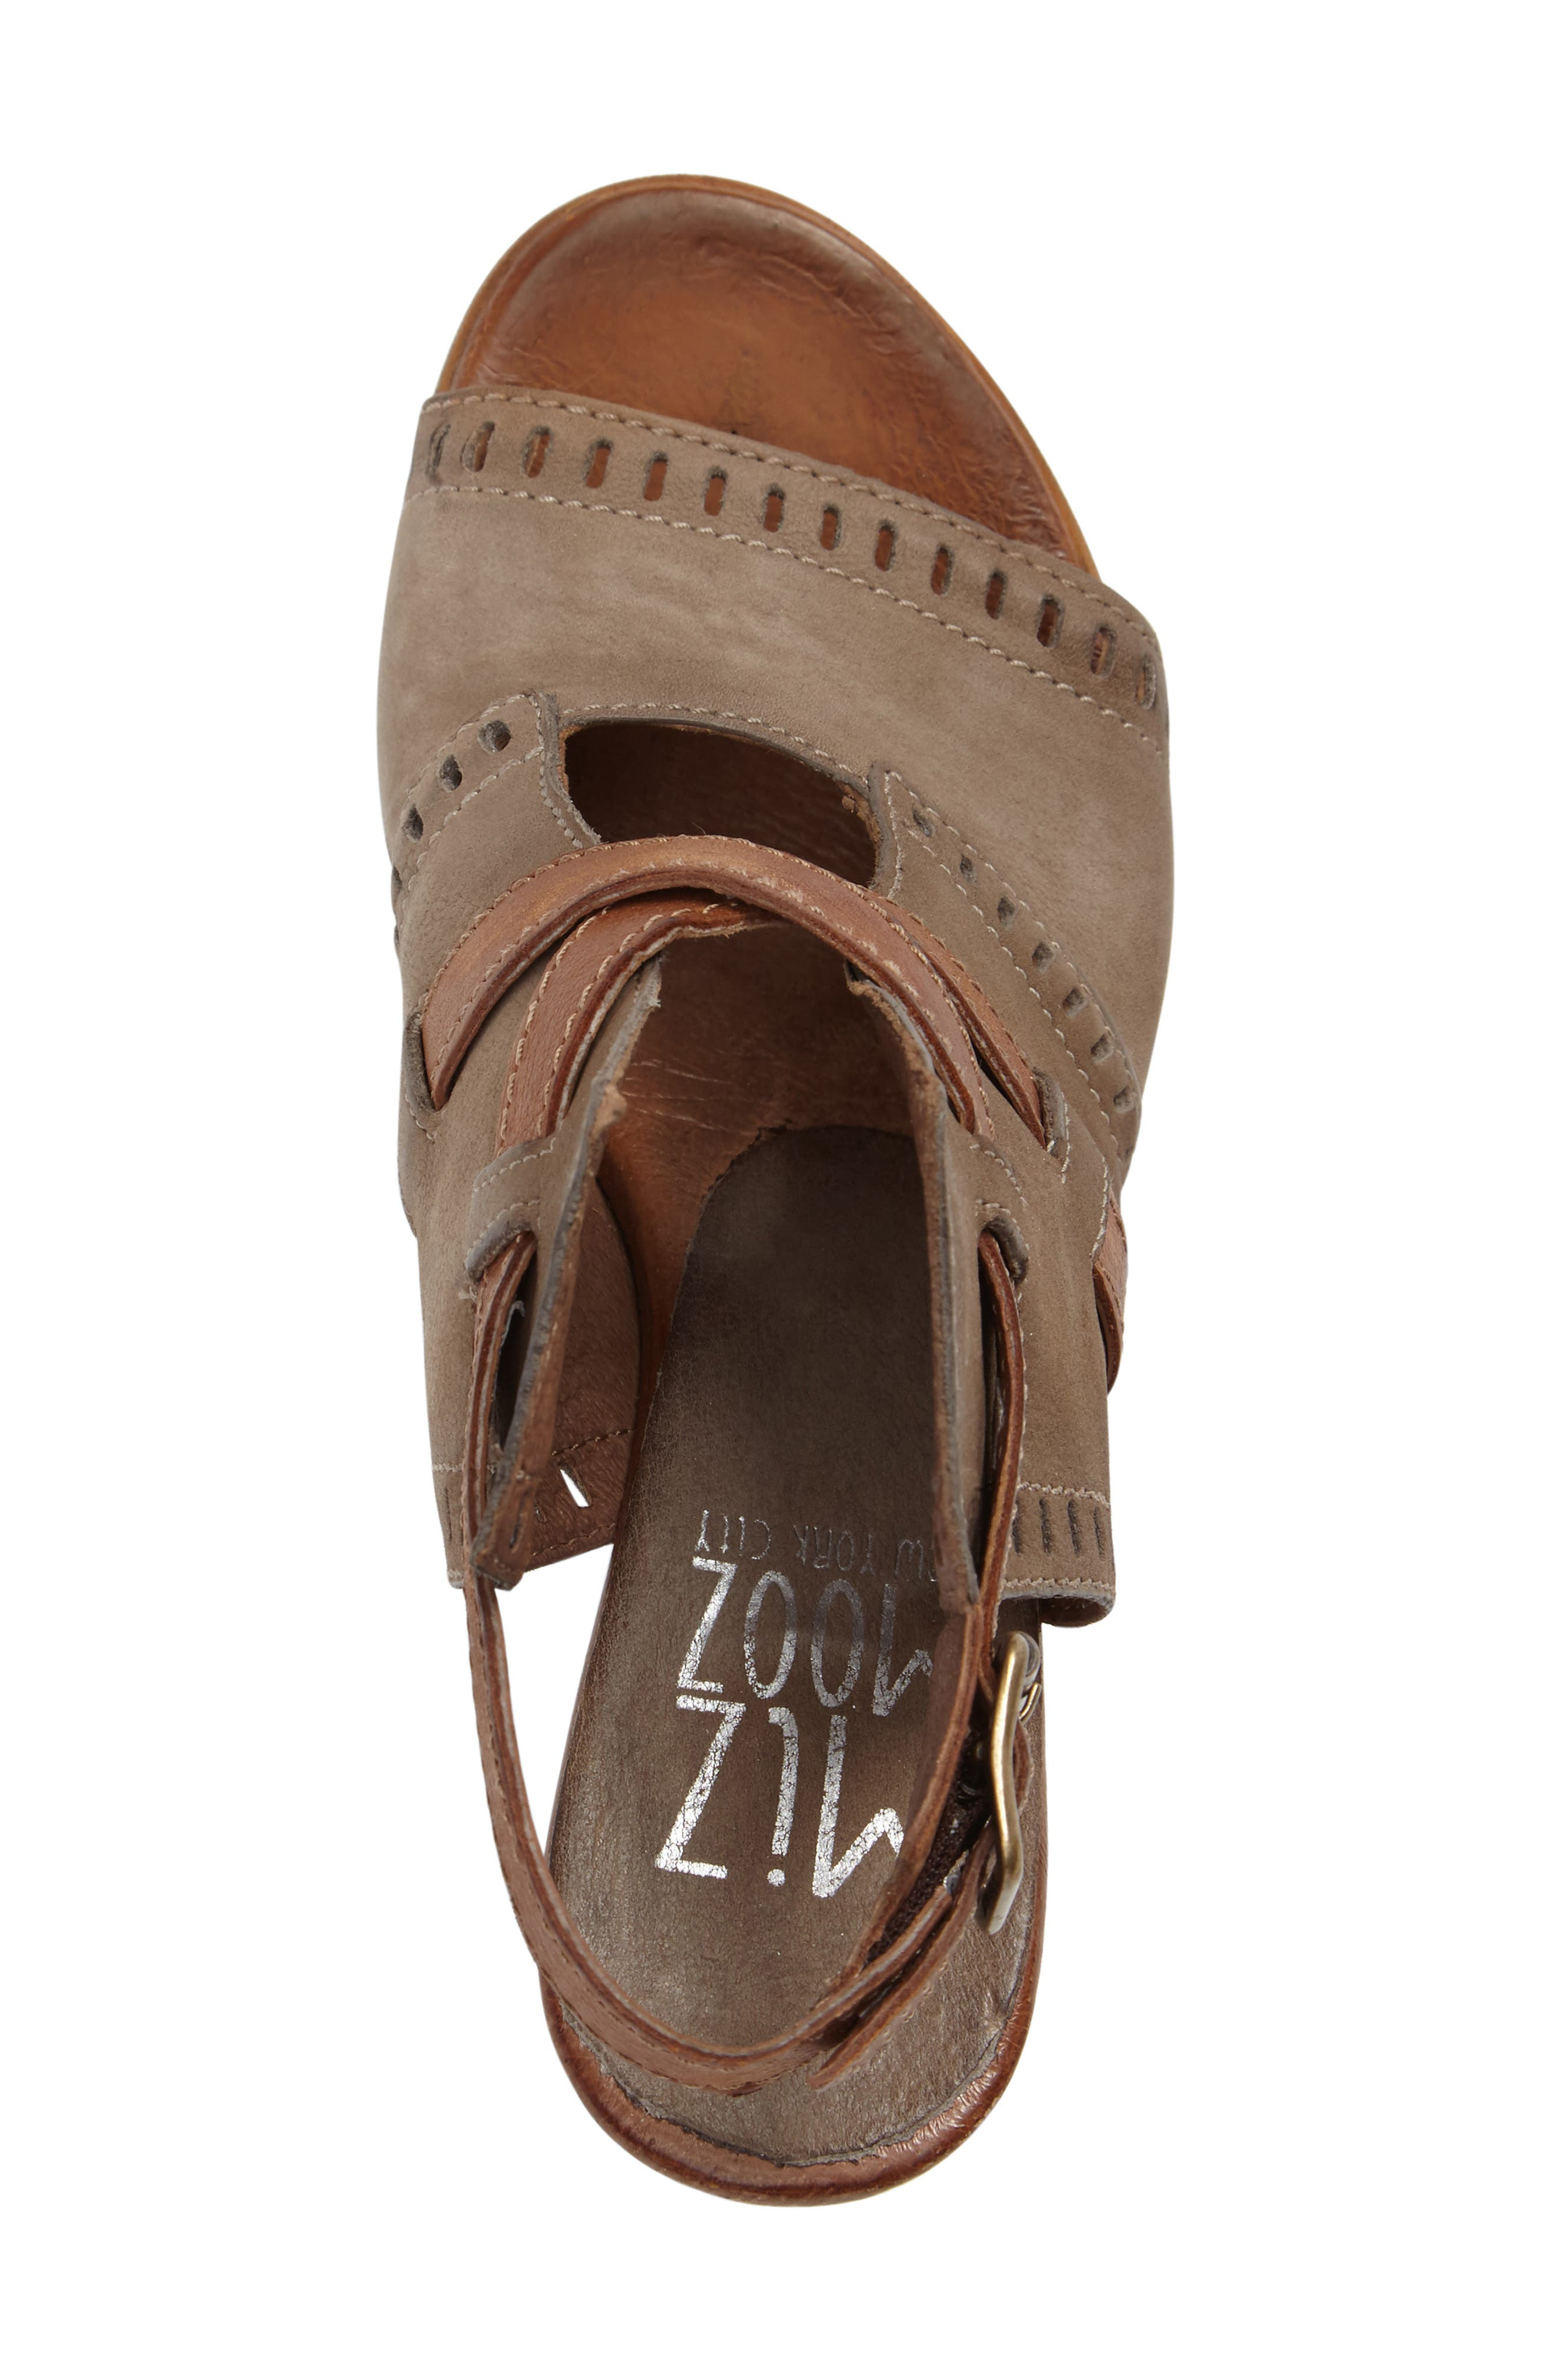 Kipling Perforated Sandal,                             Alternate thumbnail 10, color,